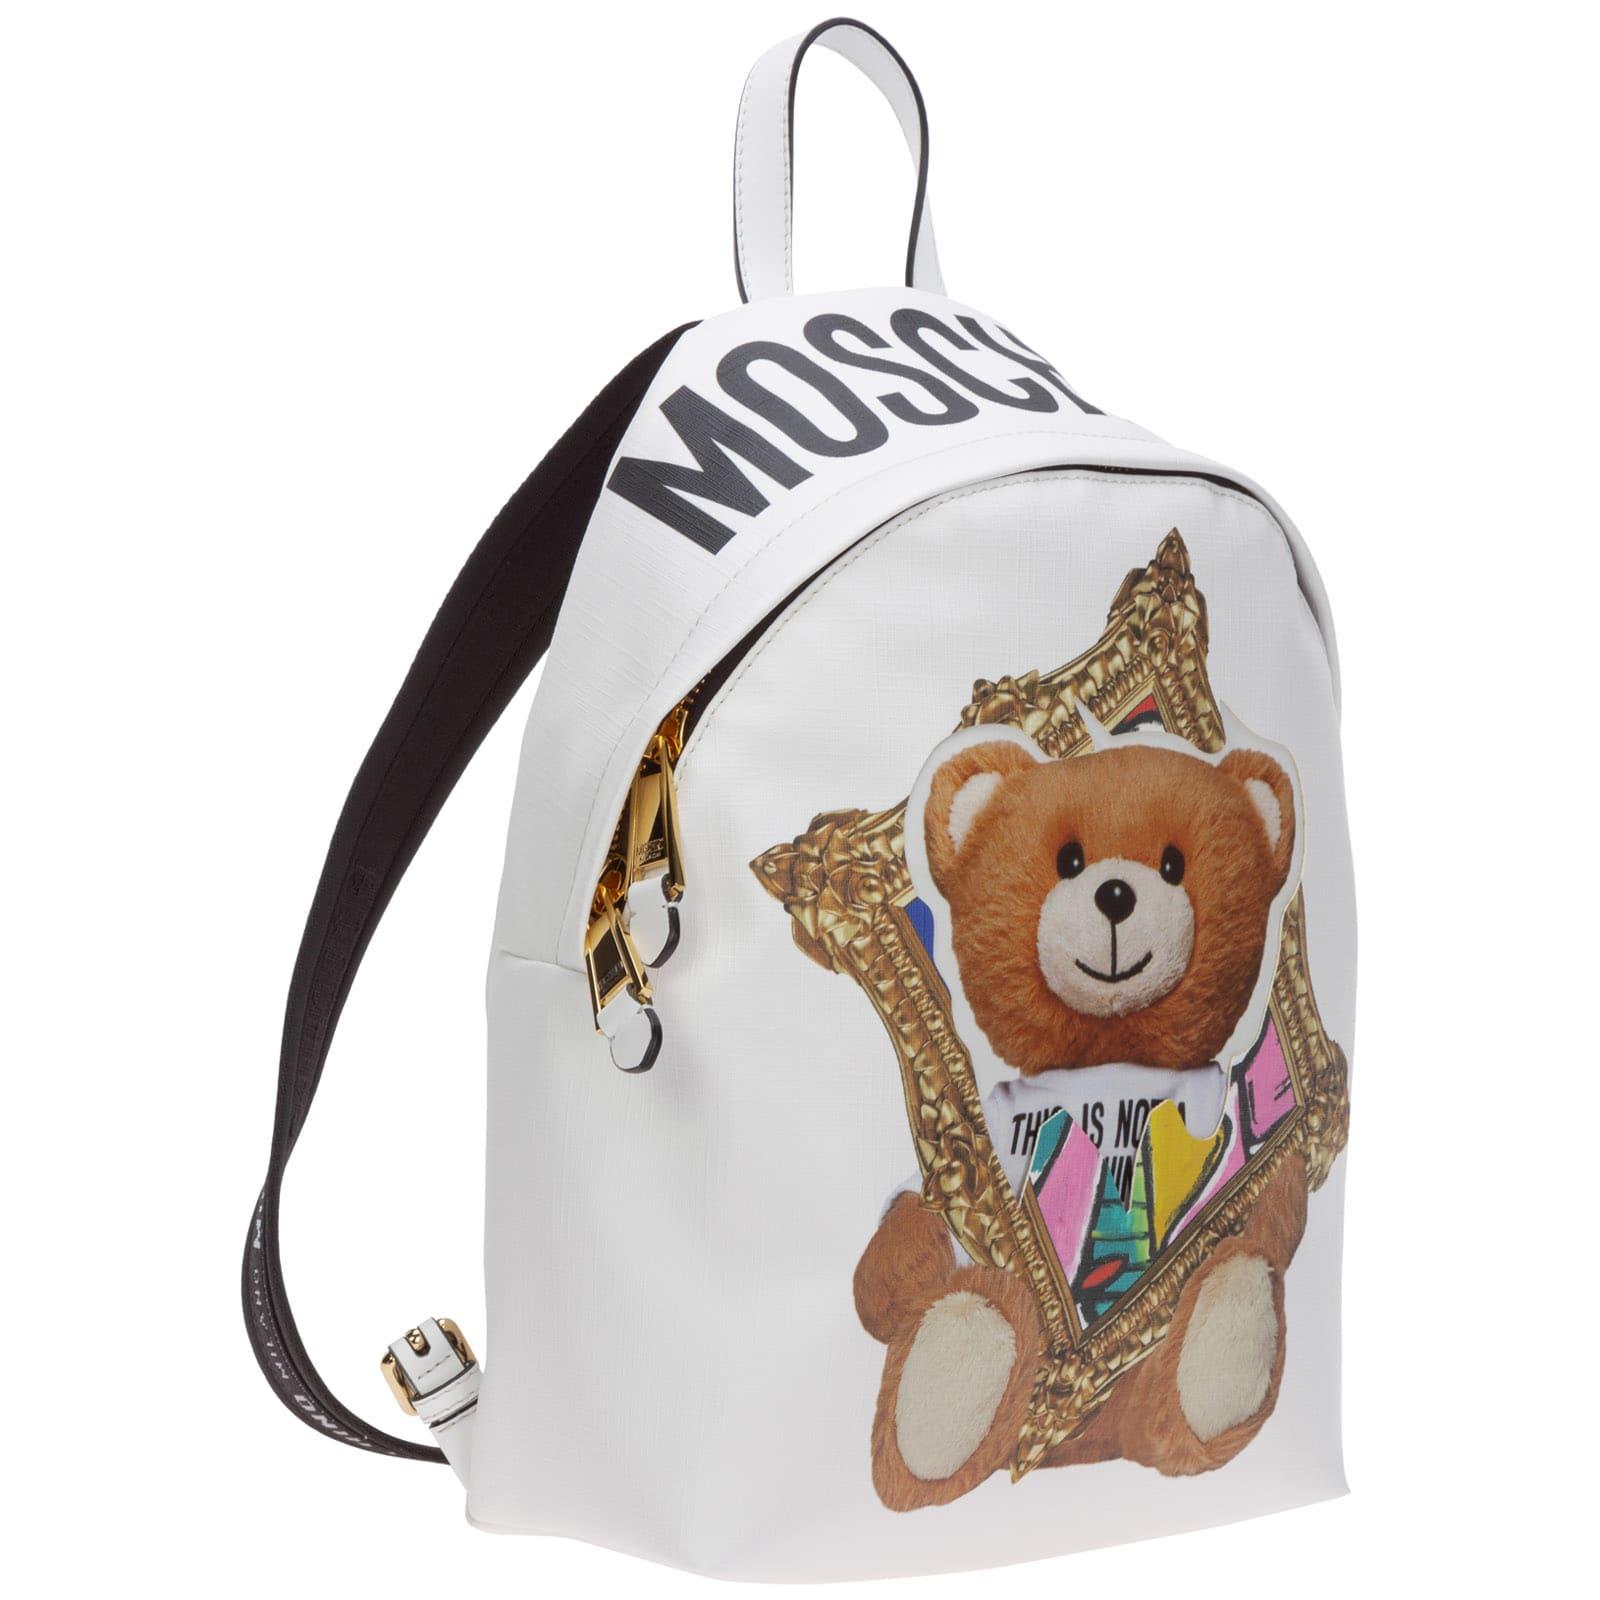 Moschino Backpacks   italist, ALWAYS LIKE A SALE